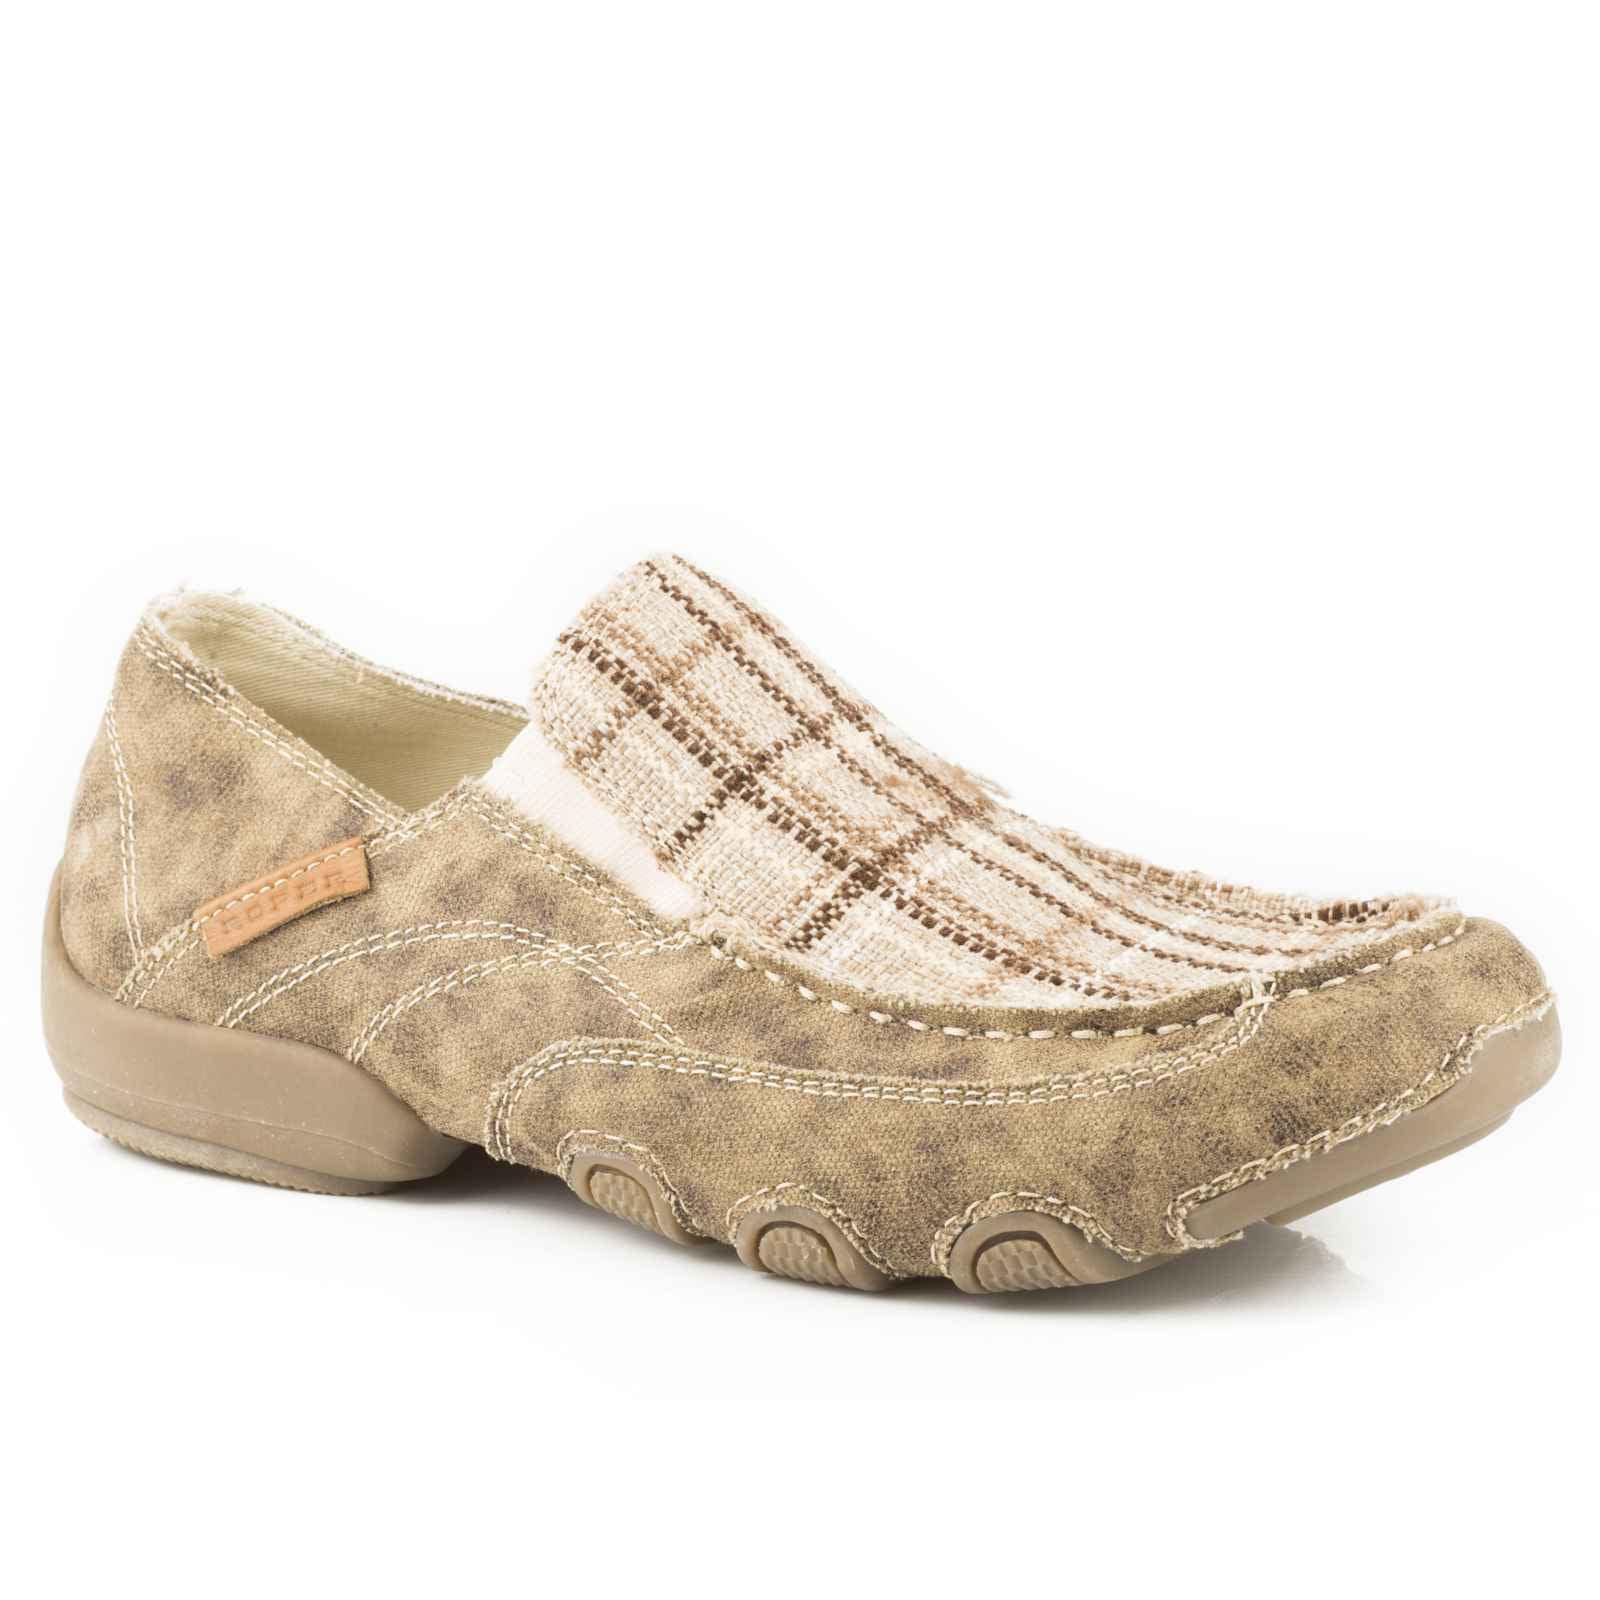 Roper Men's Distressed Dougie Casual Driving Moc Shoes - 09-020-1776-0147 Ta